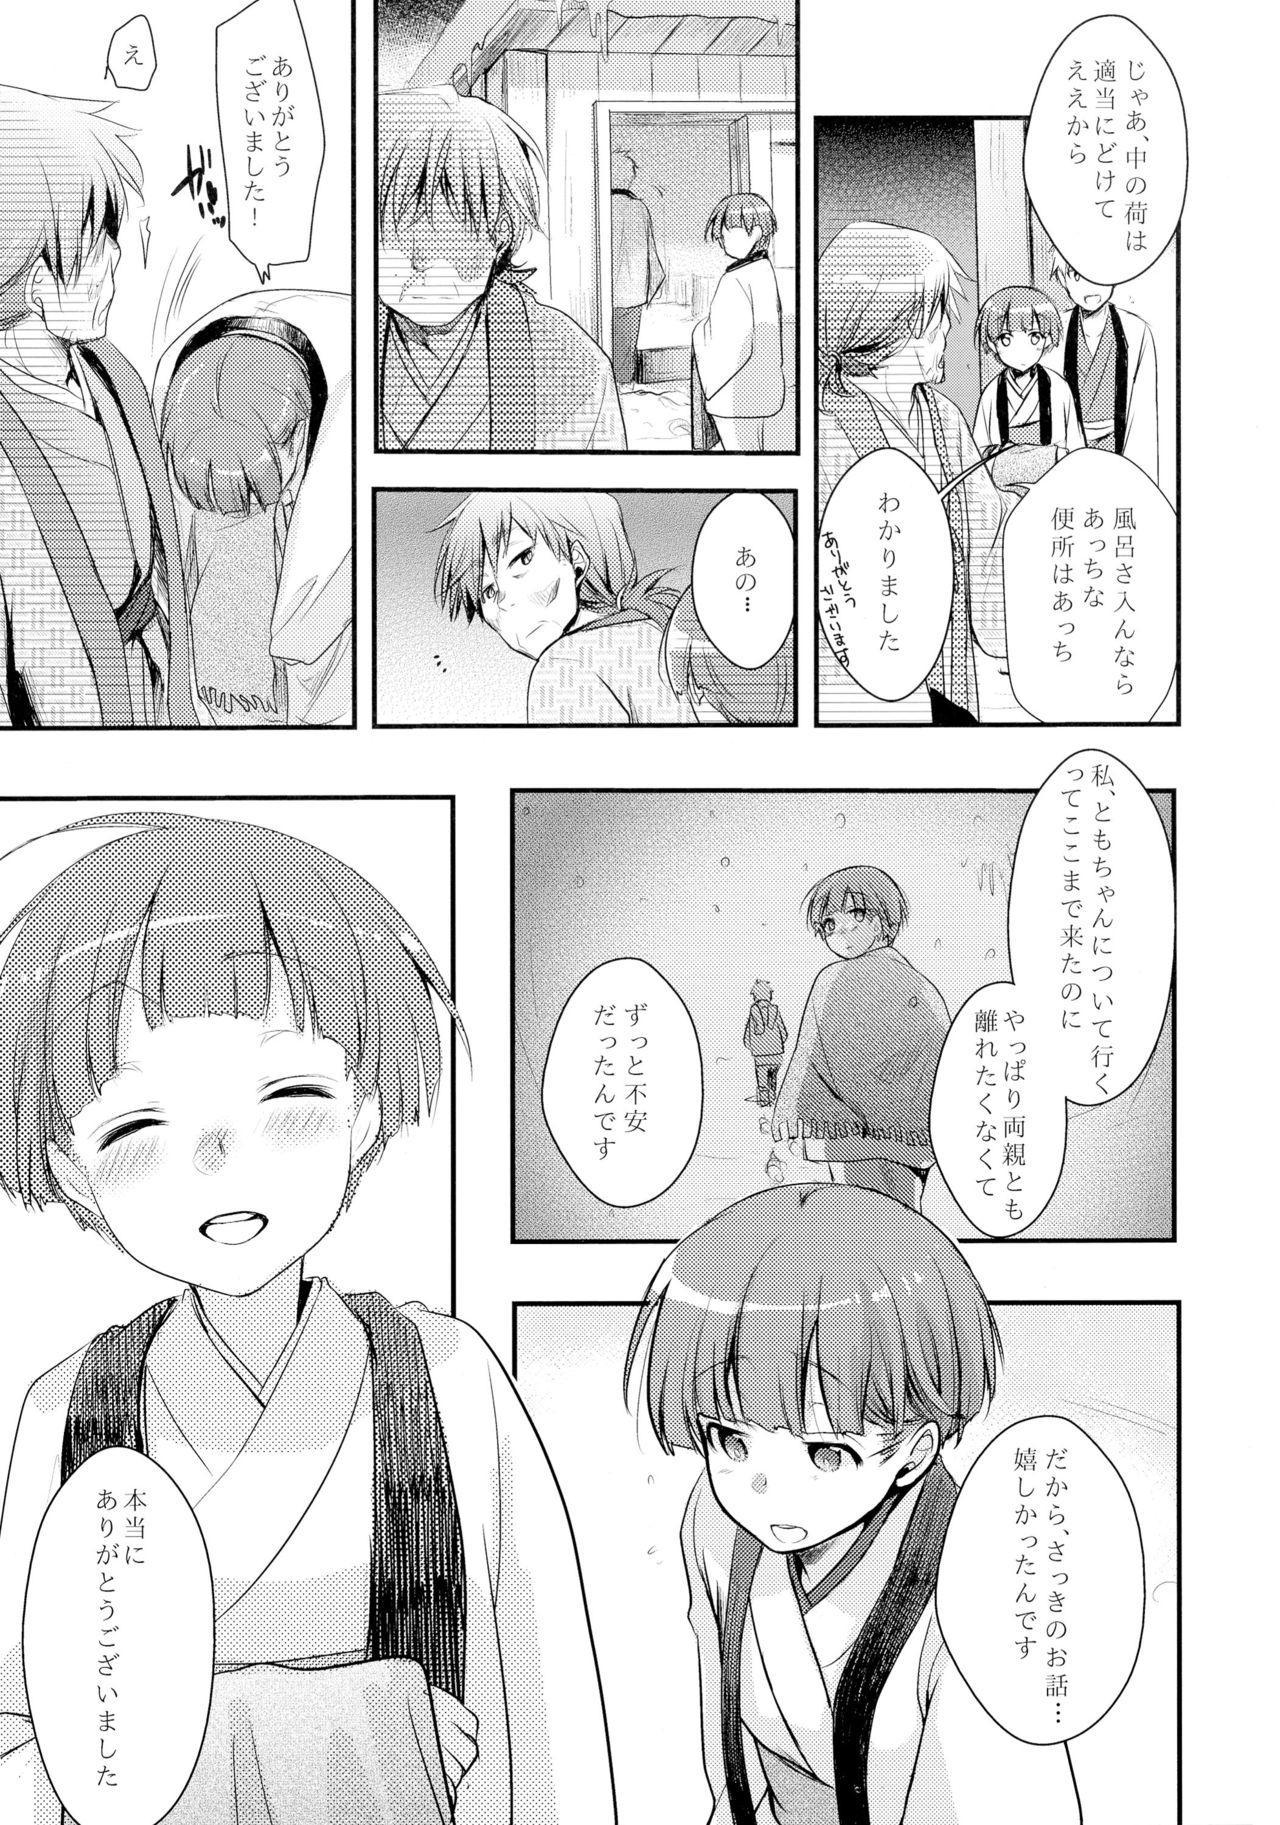 Kakeochi Shoujo Netorare 12